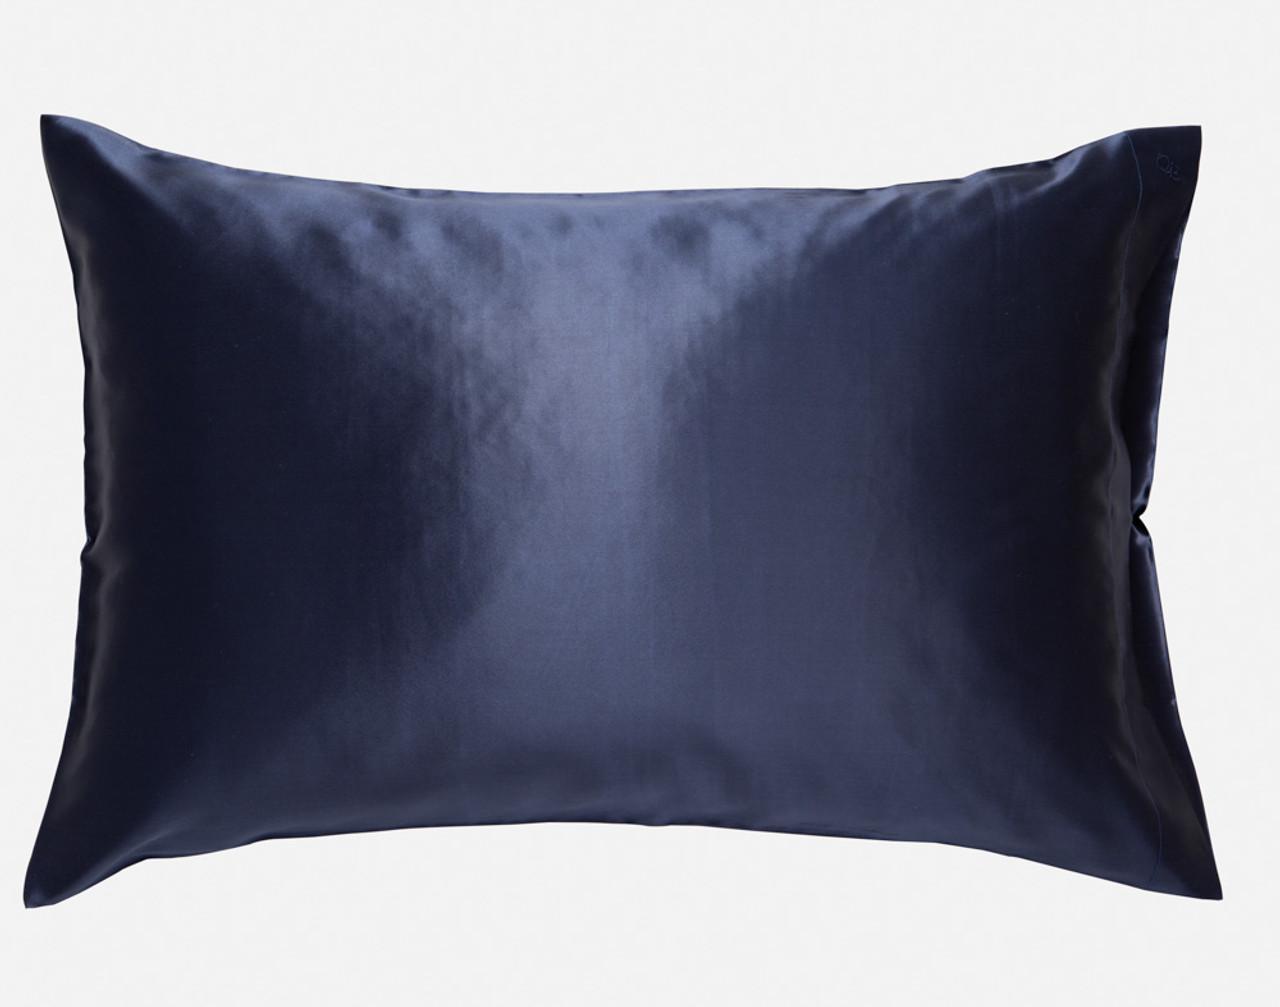 100% Silk Pillowcase in Navy Blue.